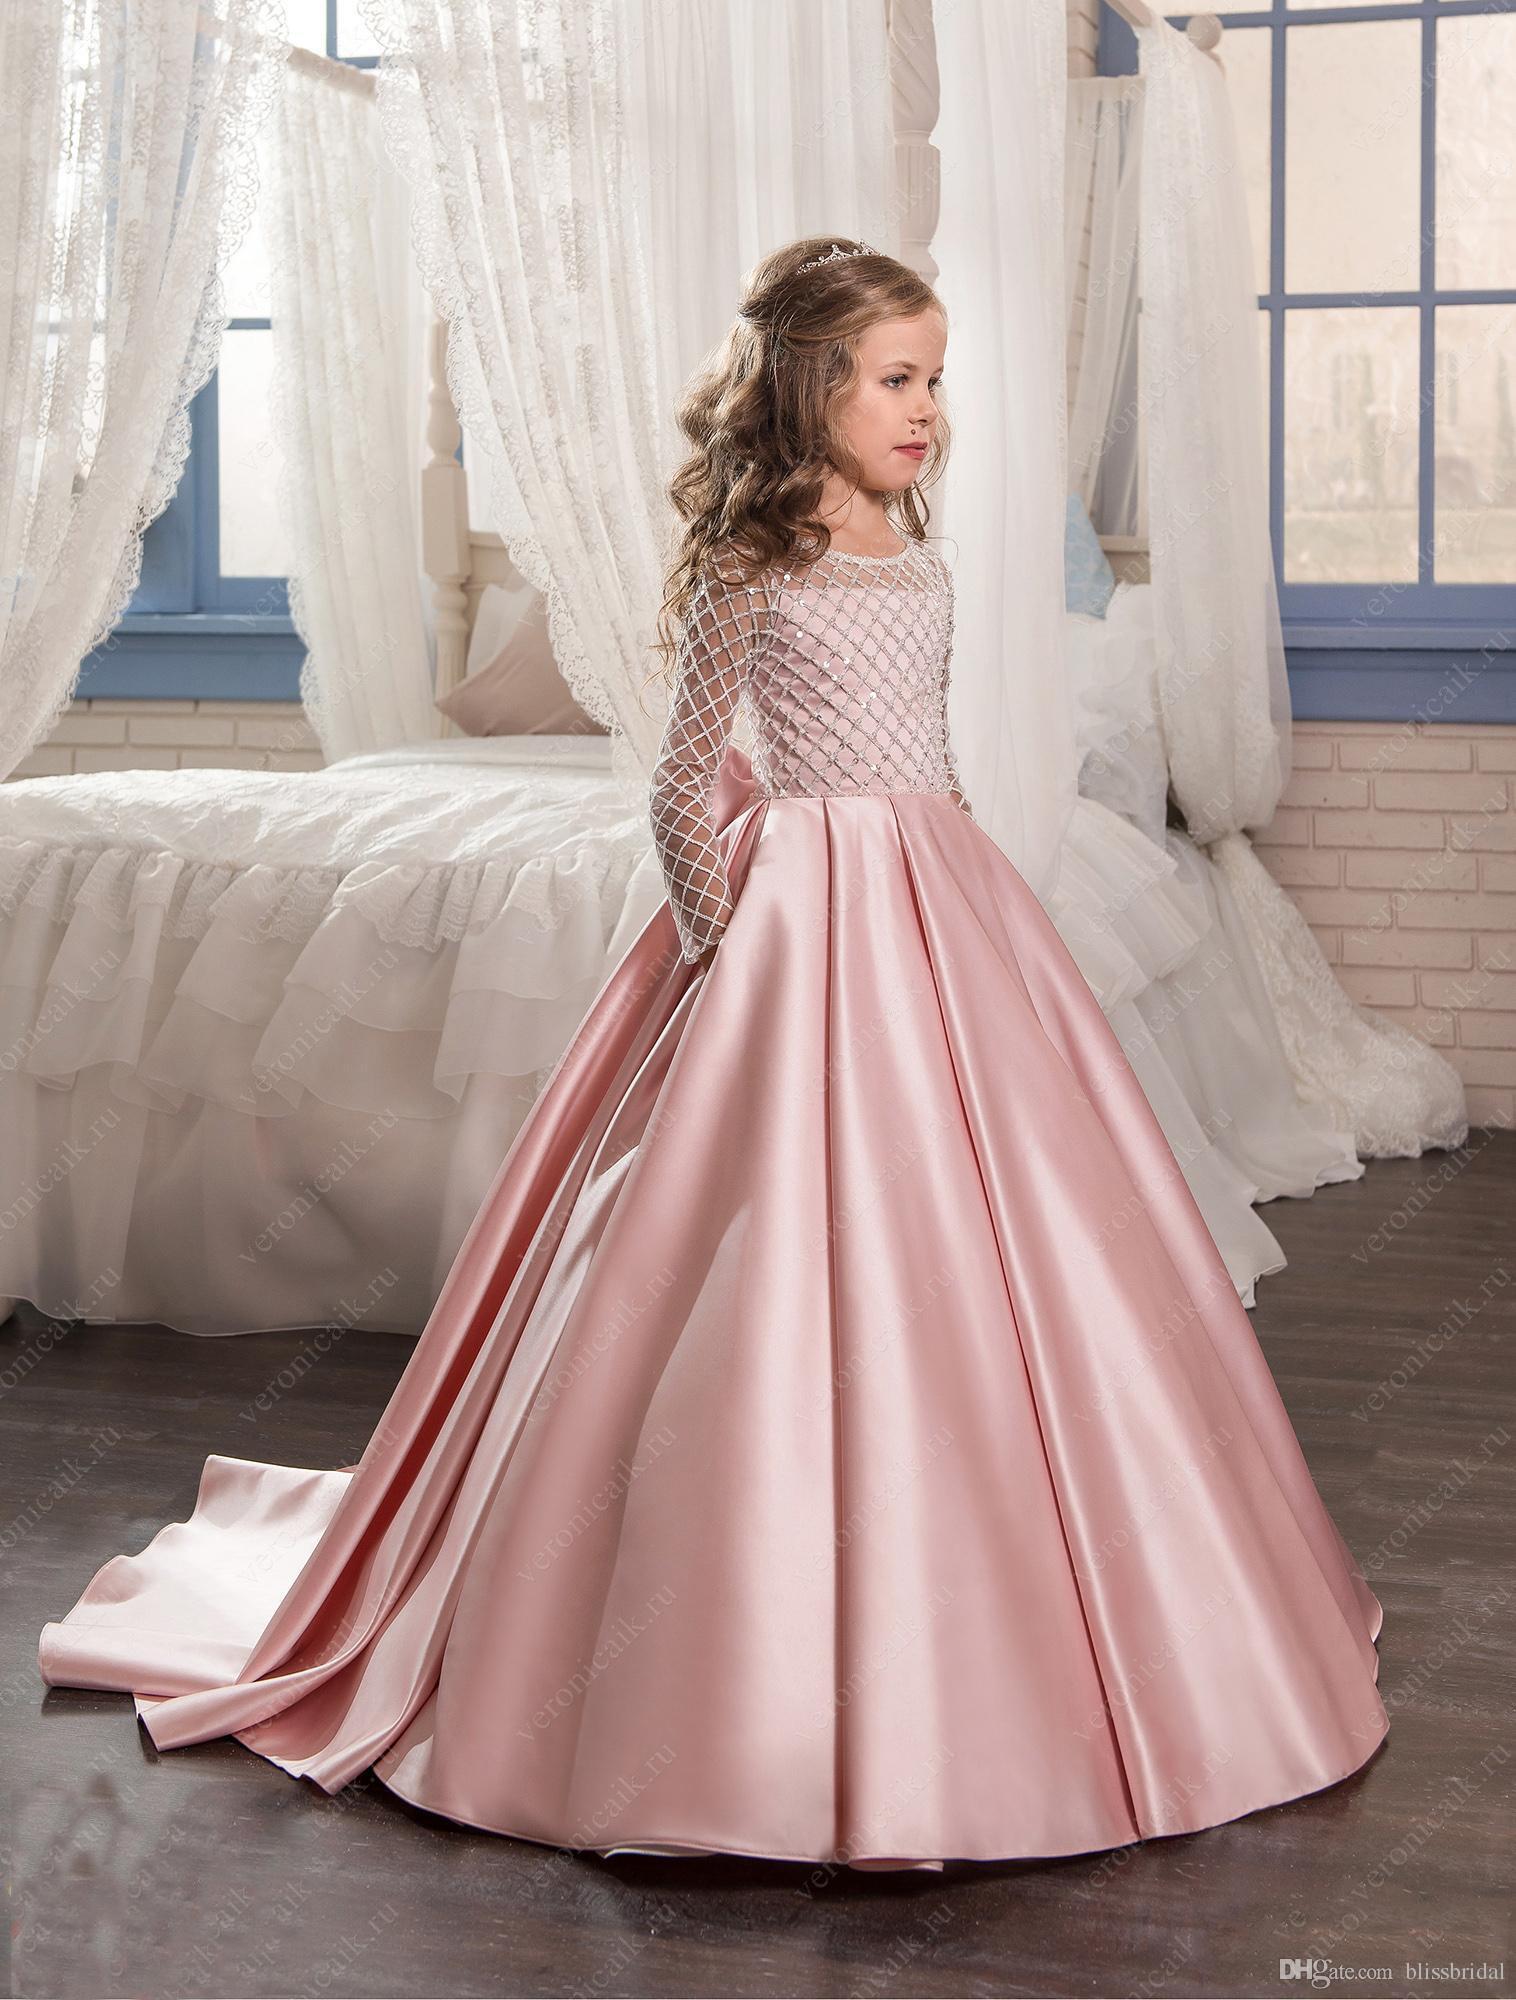 Pink Color Flower Girl Dresses 2017 Satin Bottom Kids Evening Gowns Beaded Long Sleeves Girls Pageant Dresses